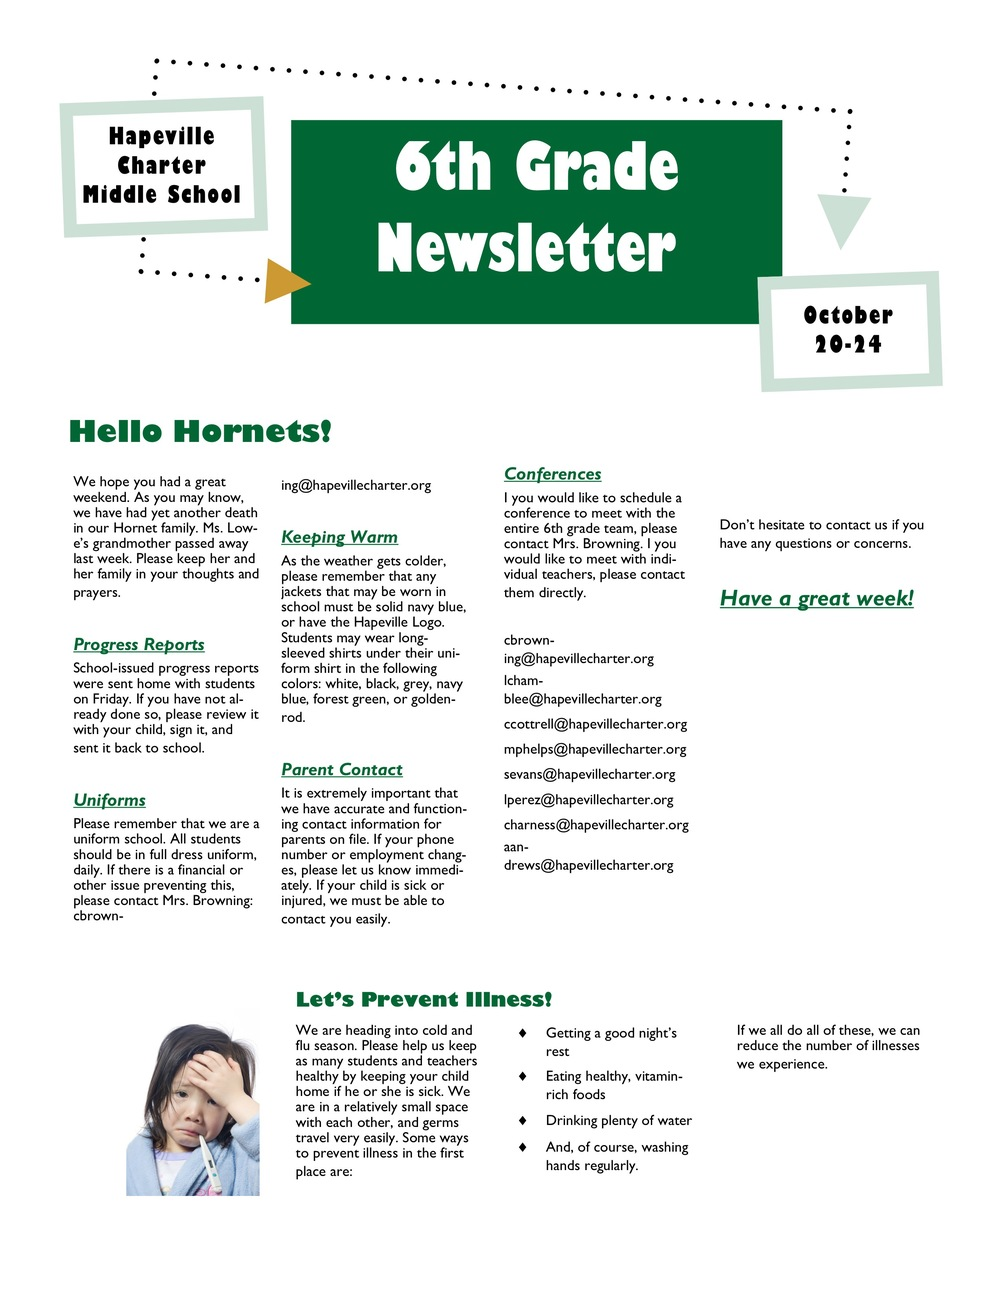 Newsletter Image6th grade 10-20.jpeg